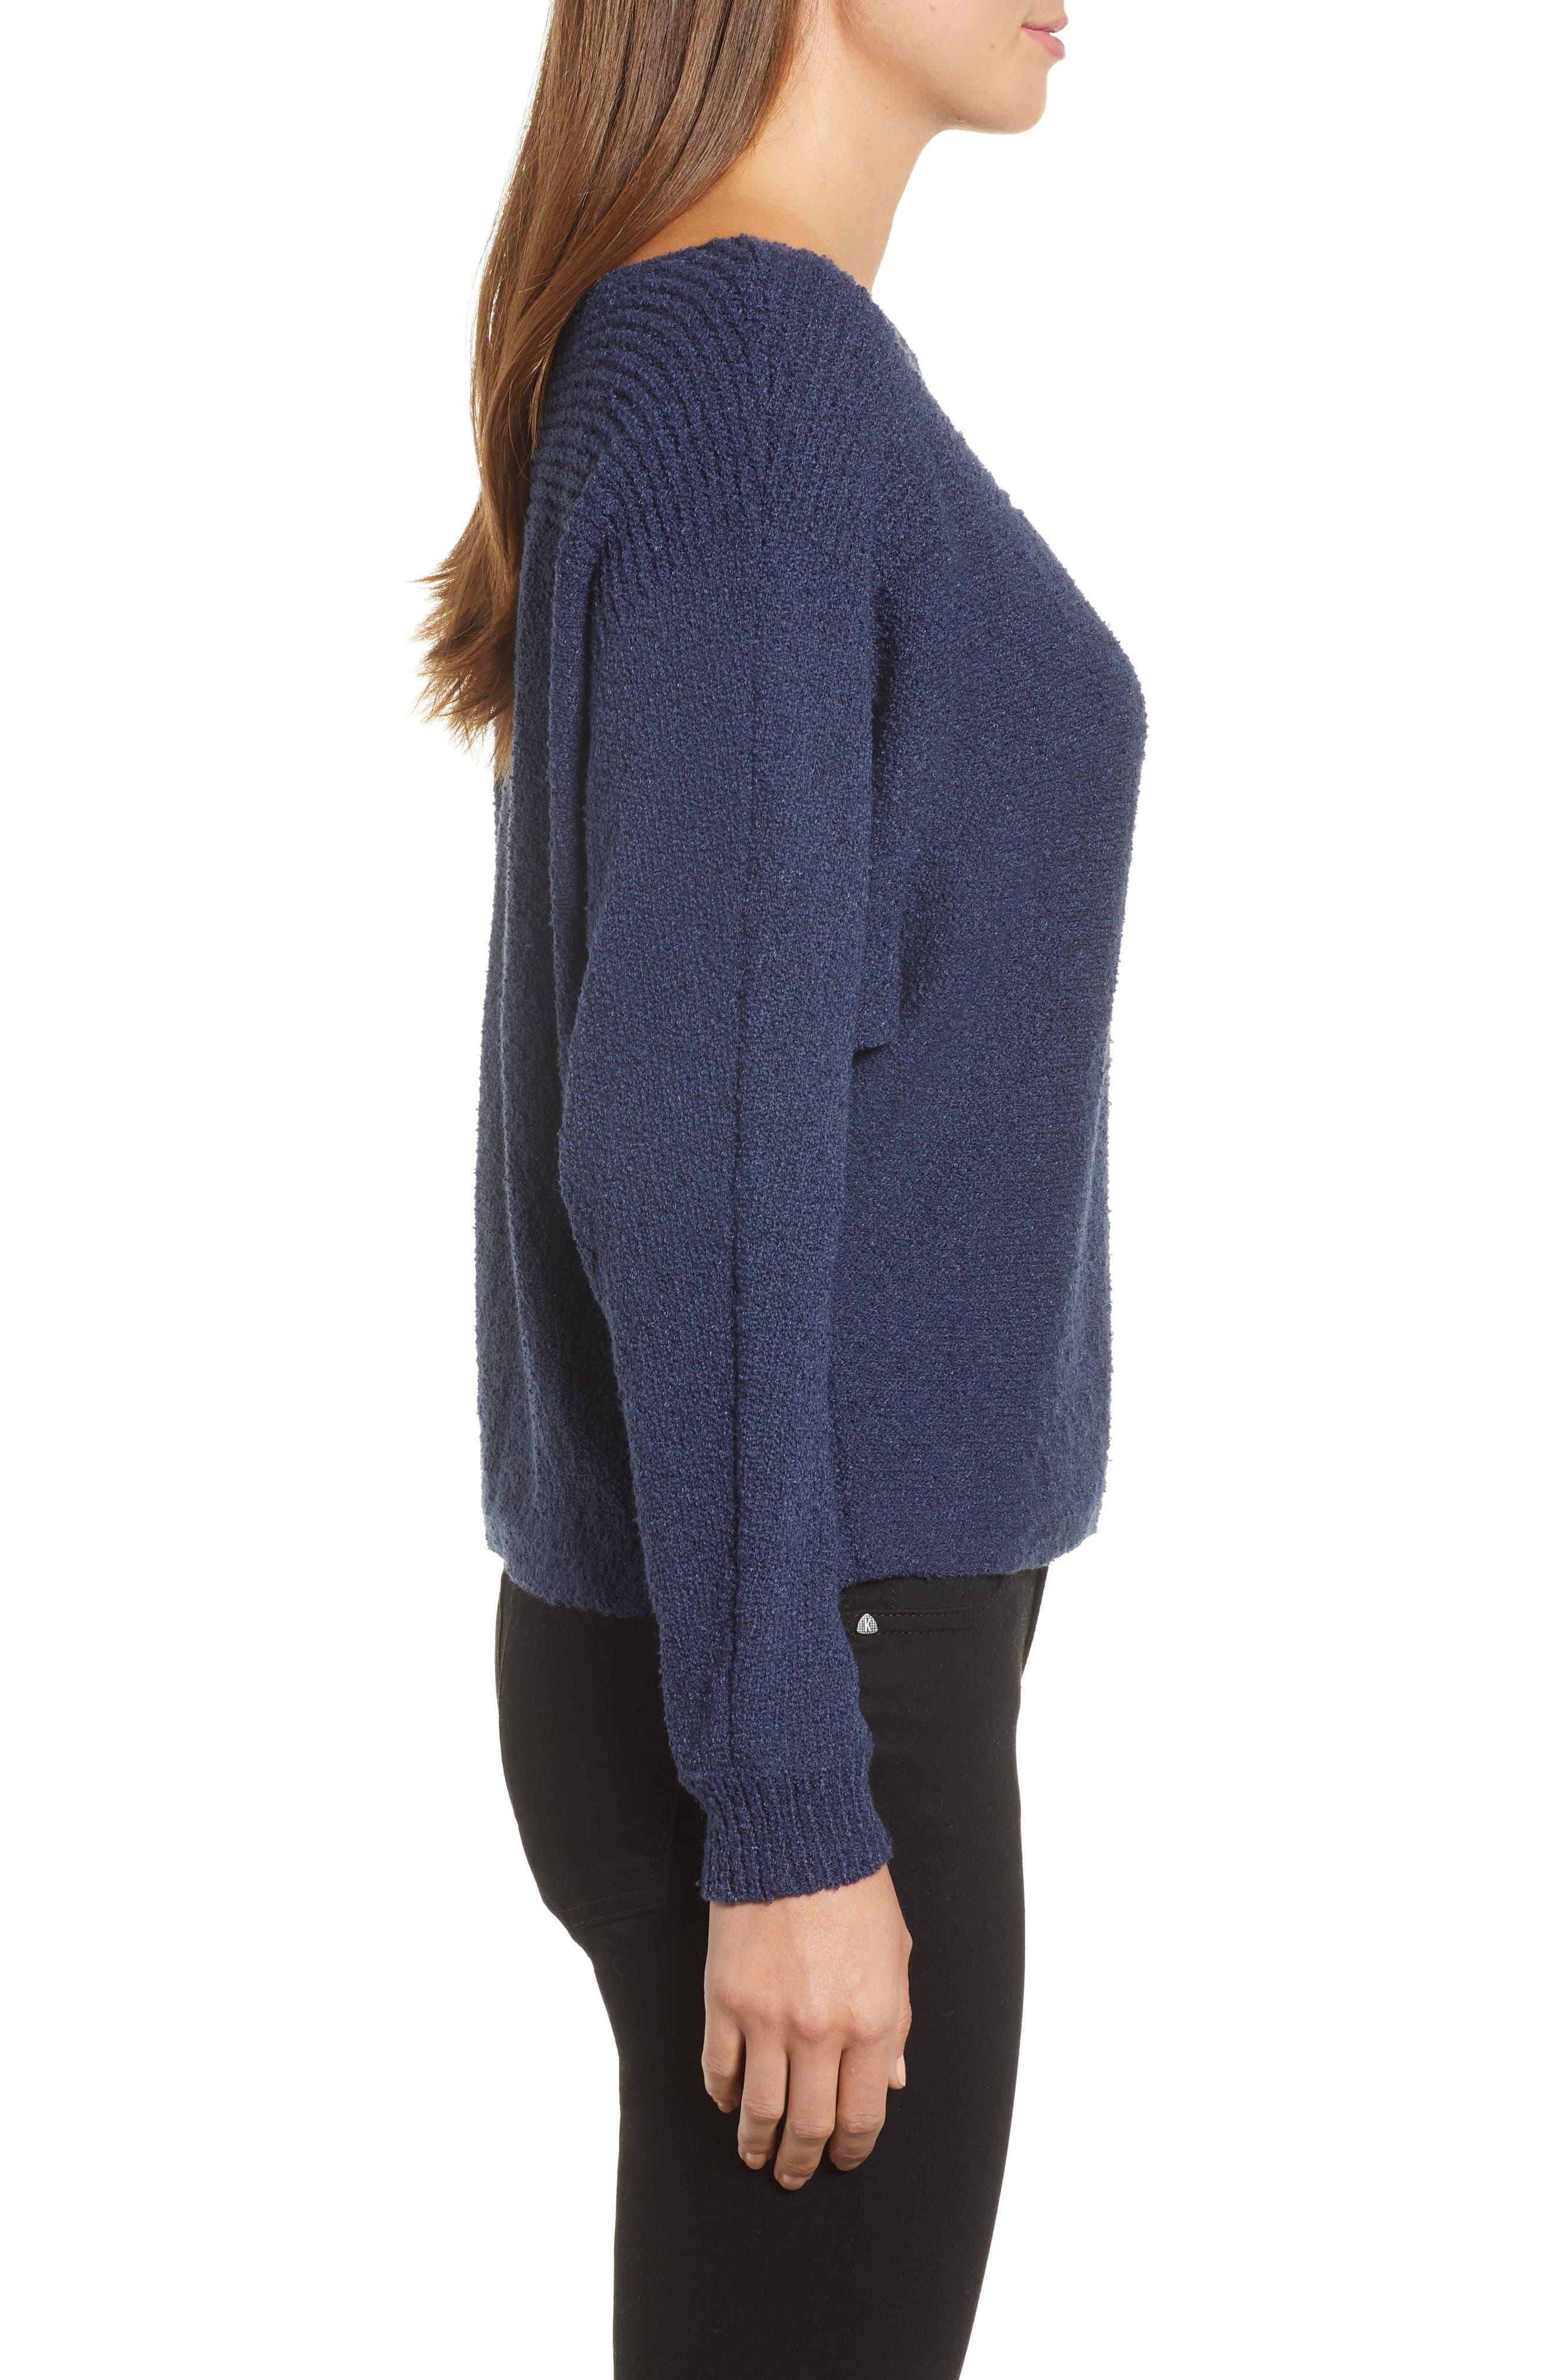 Calson<sup>®</sup> Dolman Sleeve Sweater,                             Alternate thumbnail 3, color,                             Navy Indigo